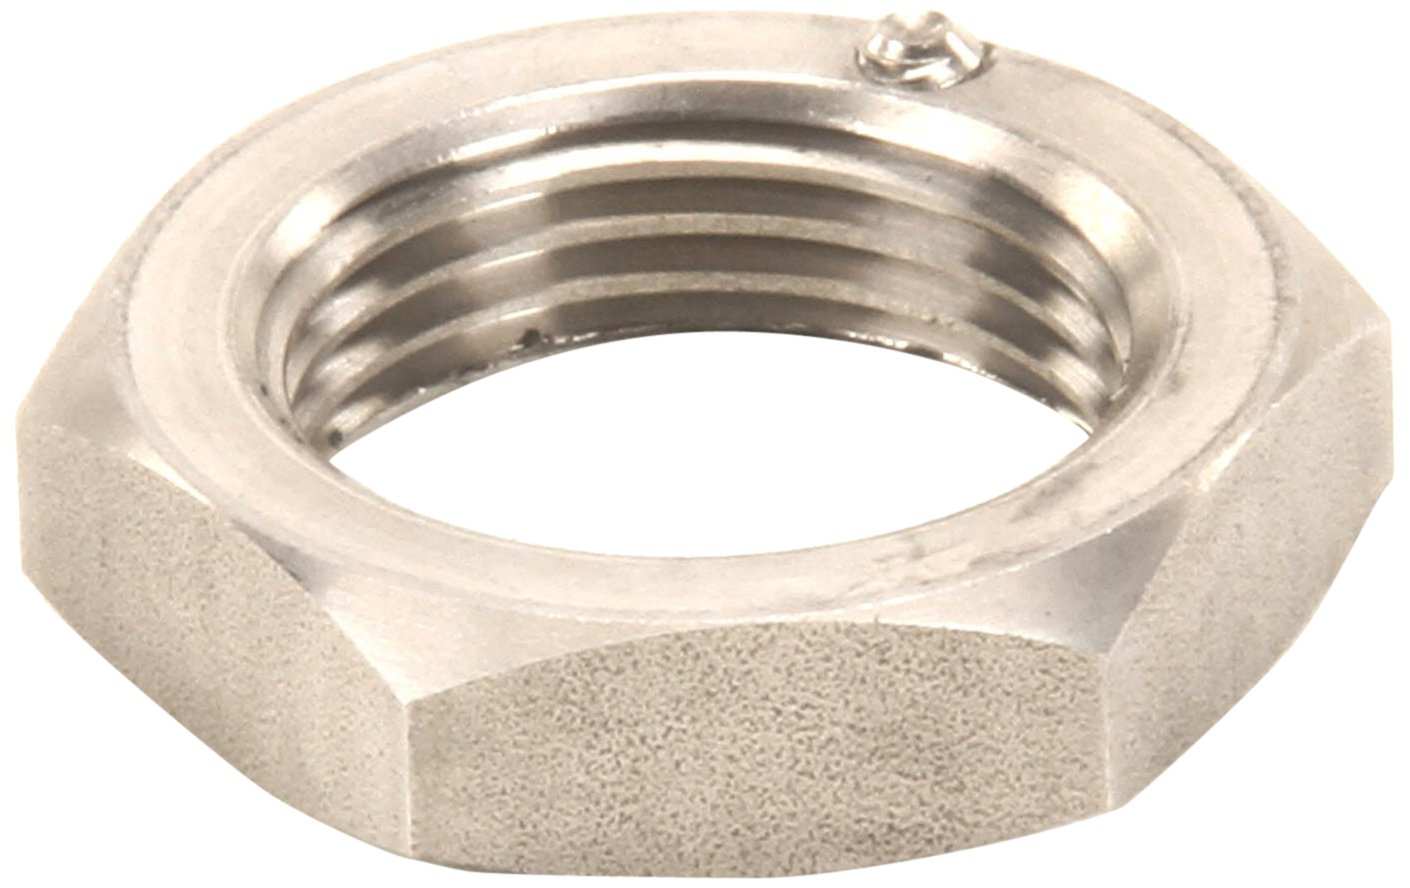 B00VVKDEZ6 Stero Dishwasher A10-1213, Locknut Convyr Bar Bearing 61Qf4tN6dJL